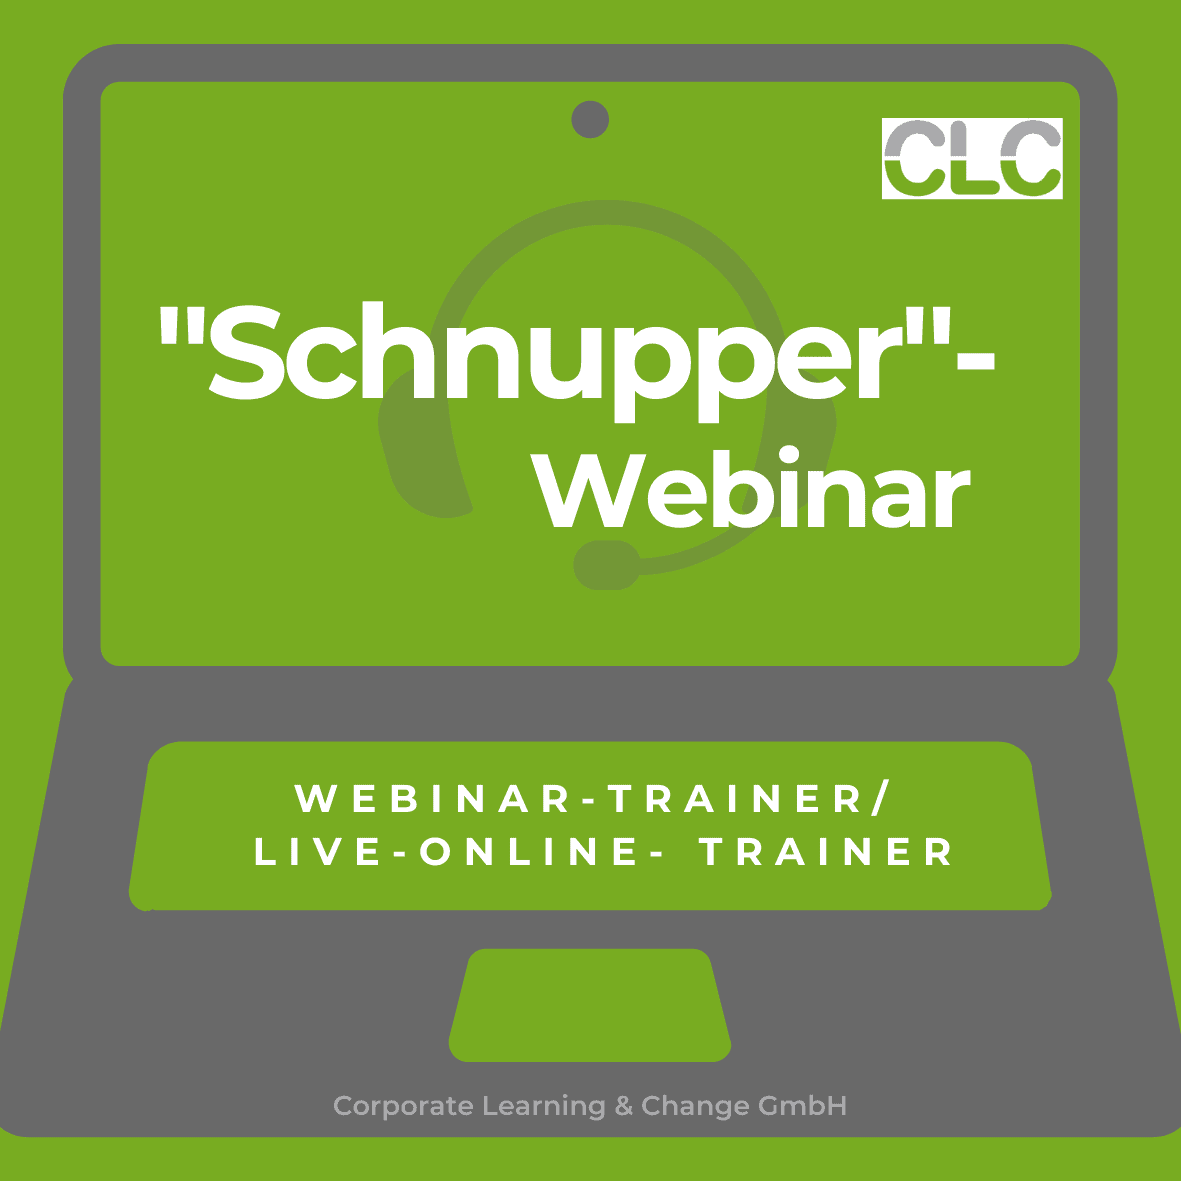 Live-Online-Trainer Webinar-Trainer